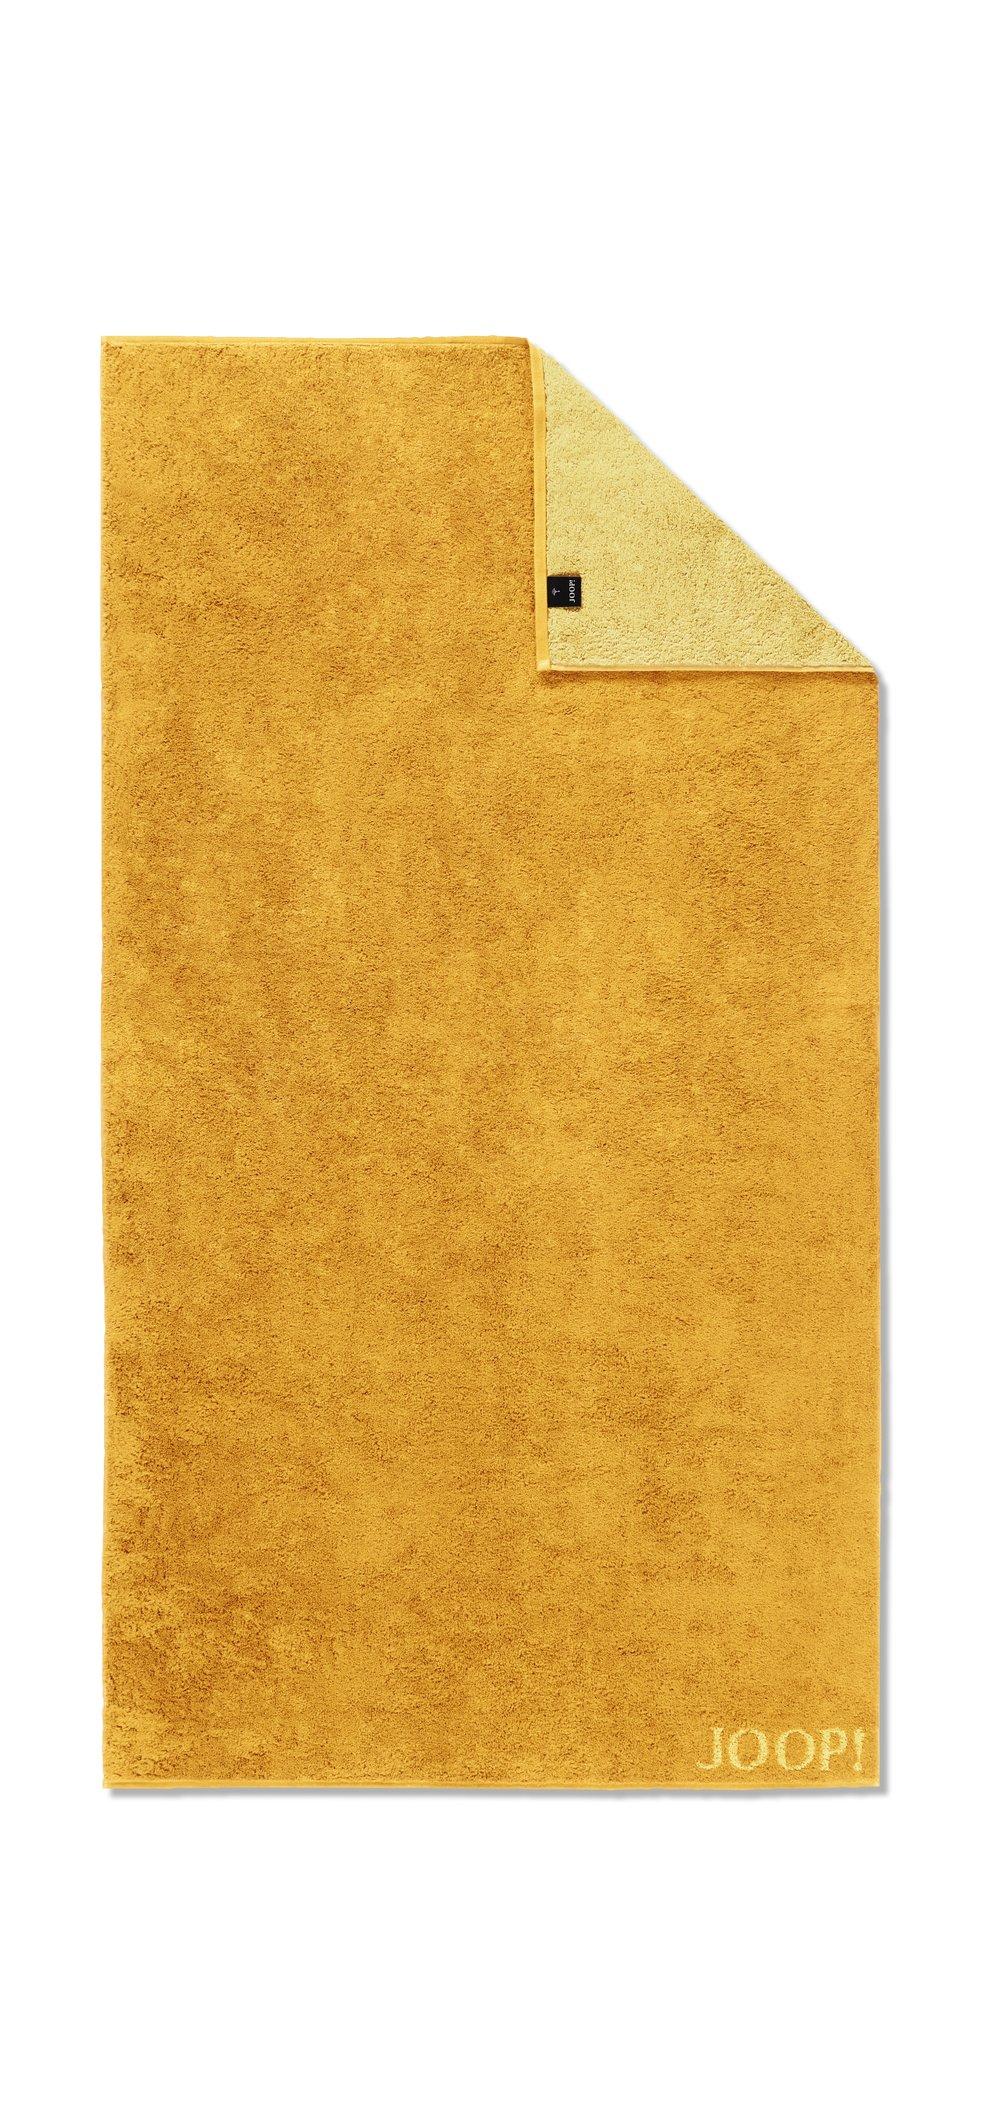 JOOP! Classic Doubleface Duschtuch 80x150 cm 1600-50 Honig